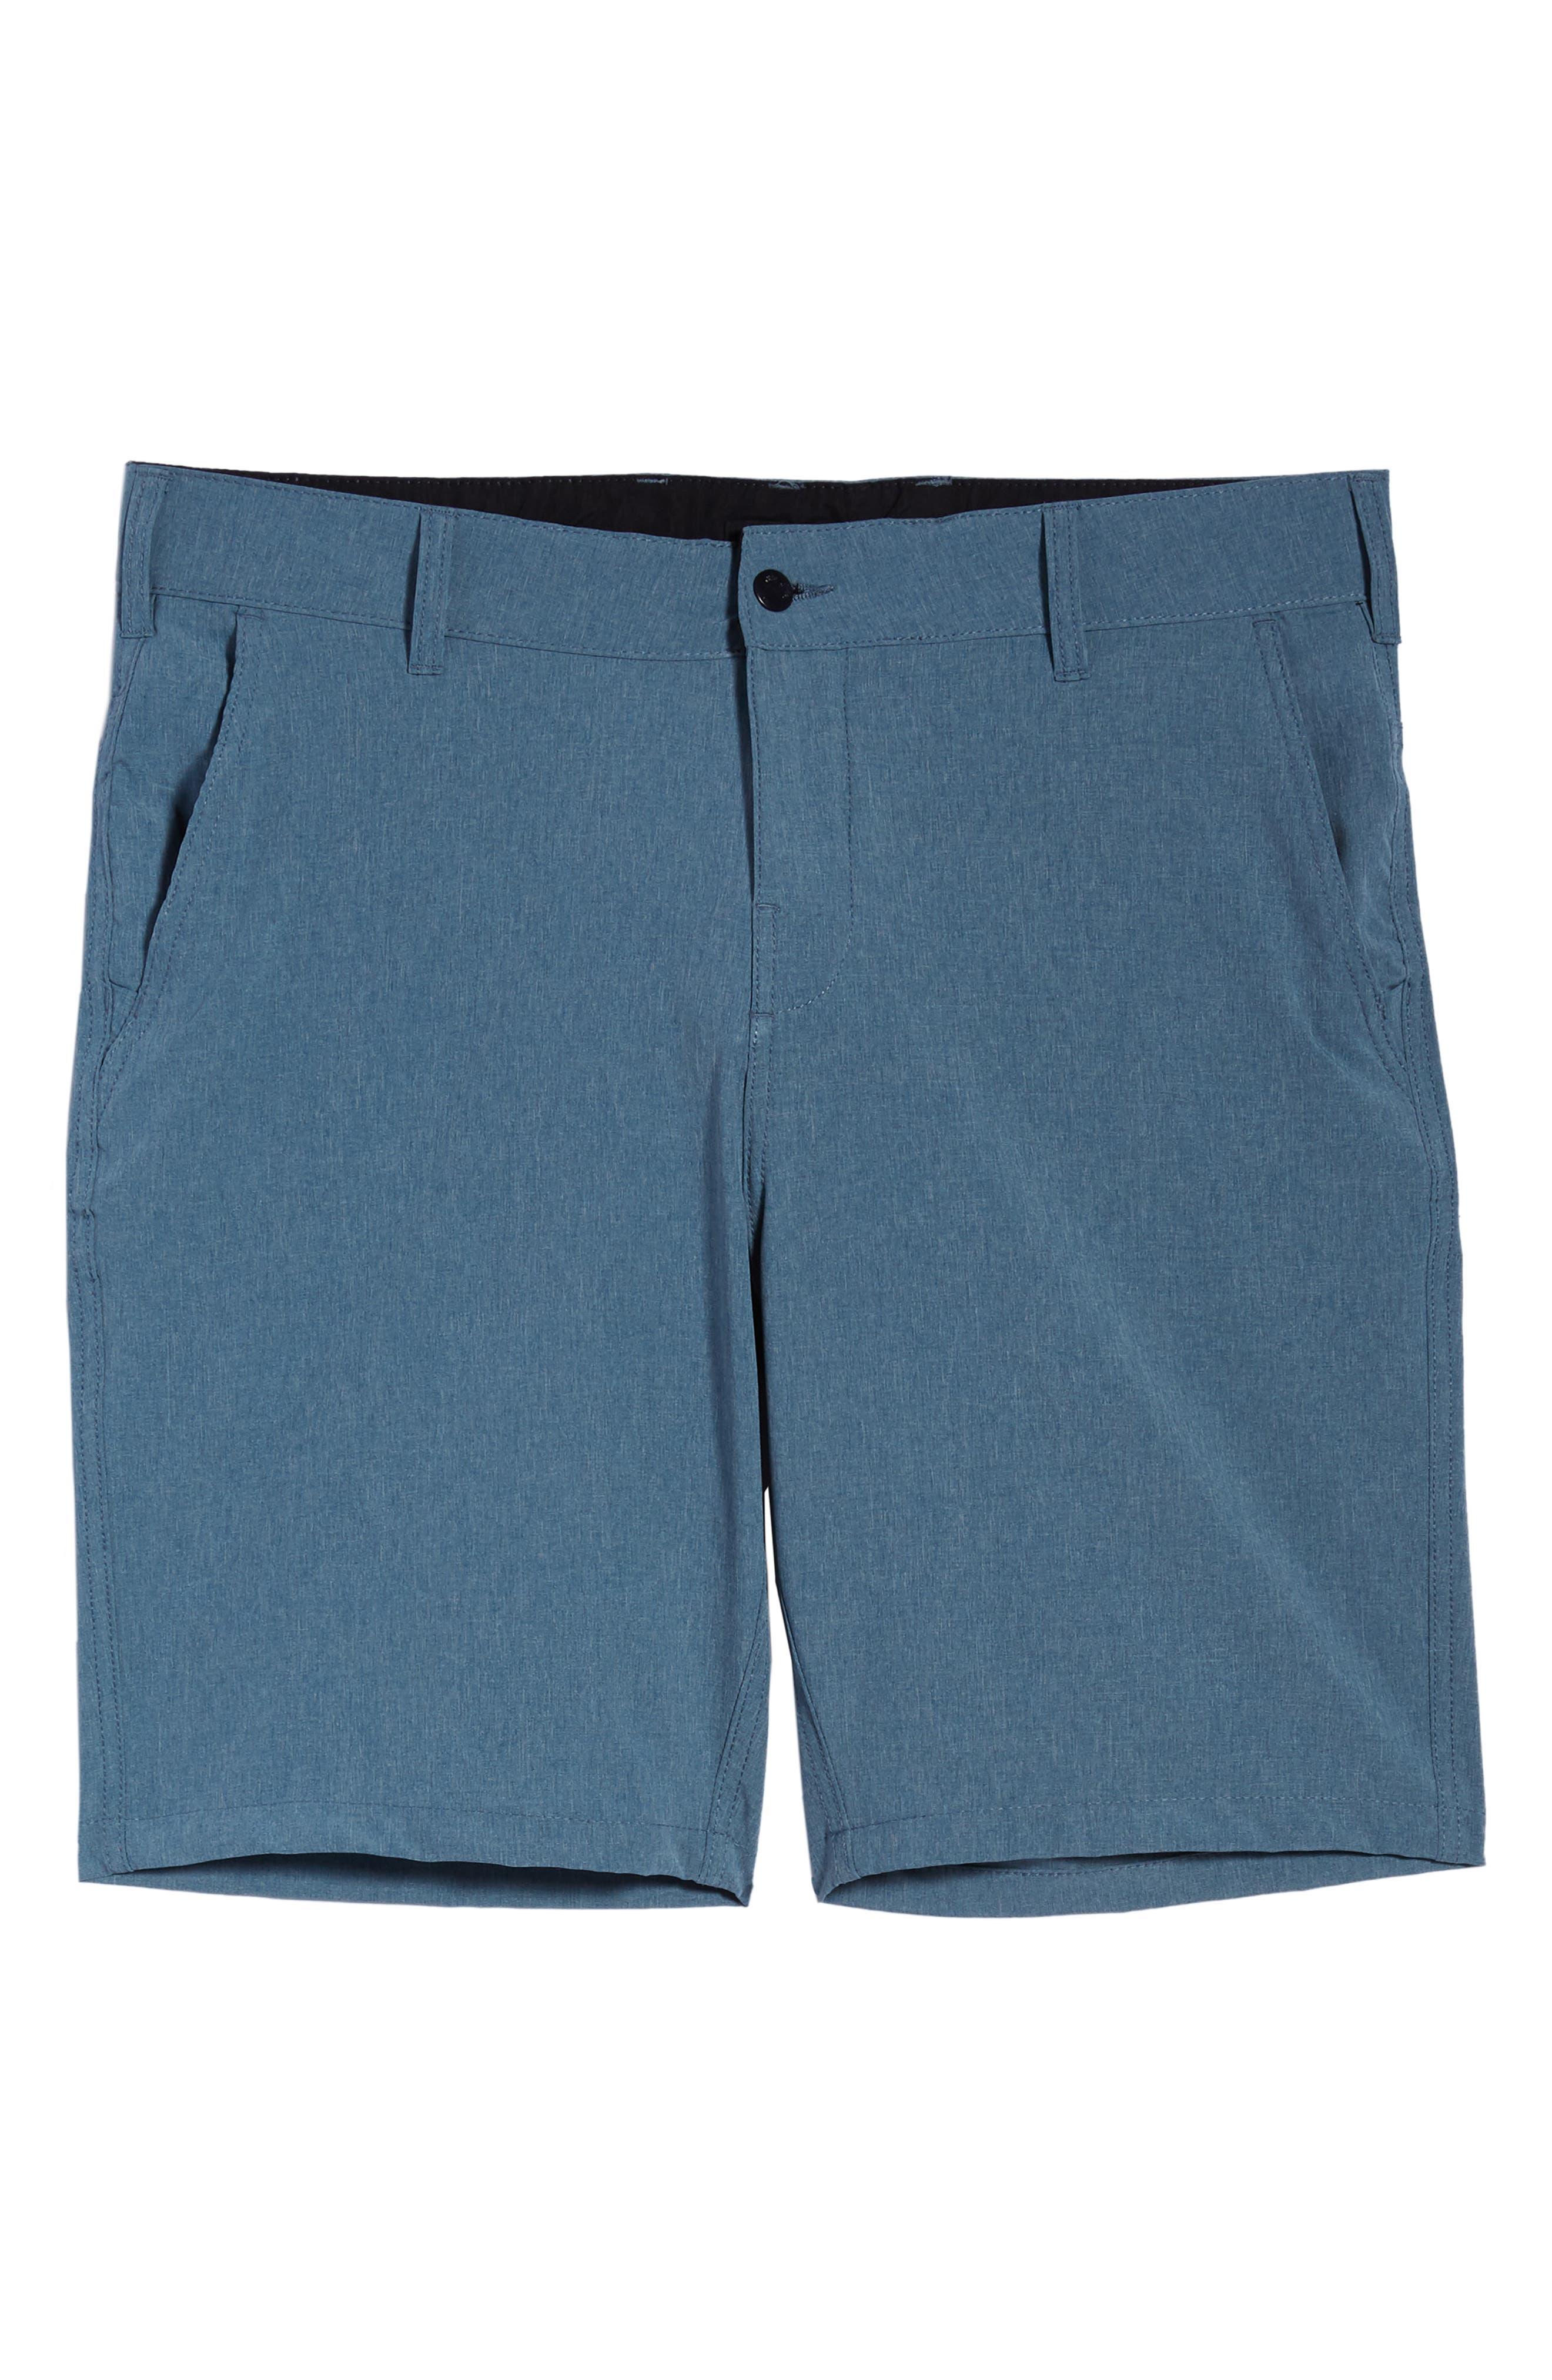 Hybrid Shorts,                             Alternate thumbnail 6, color,                             MEDITERRANEAN